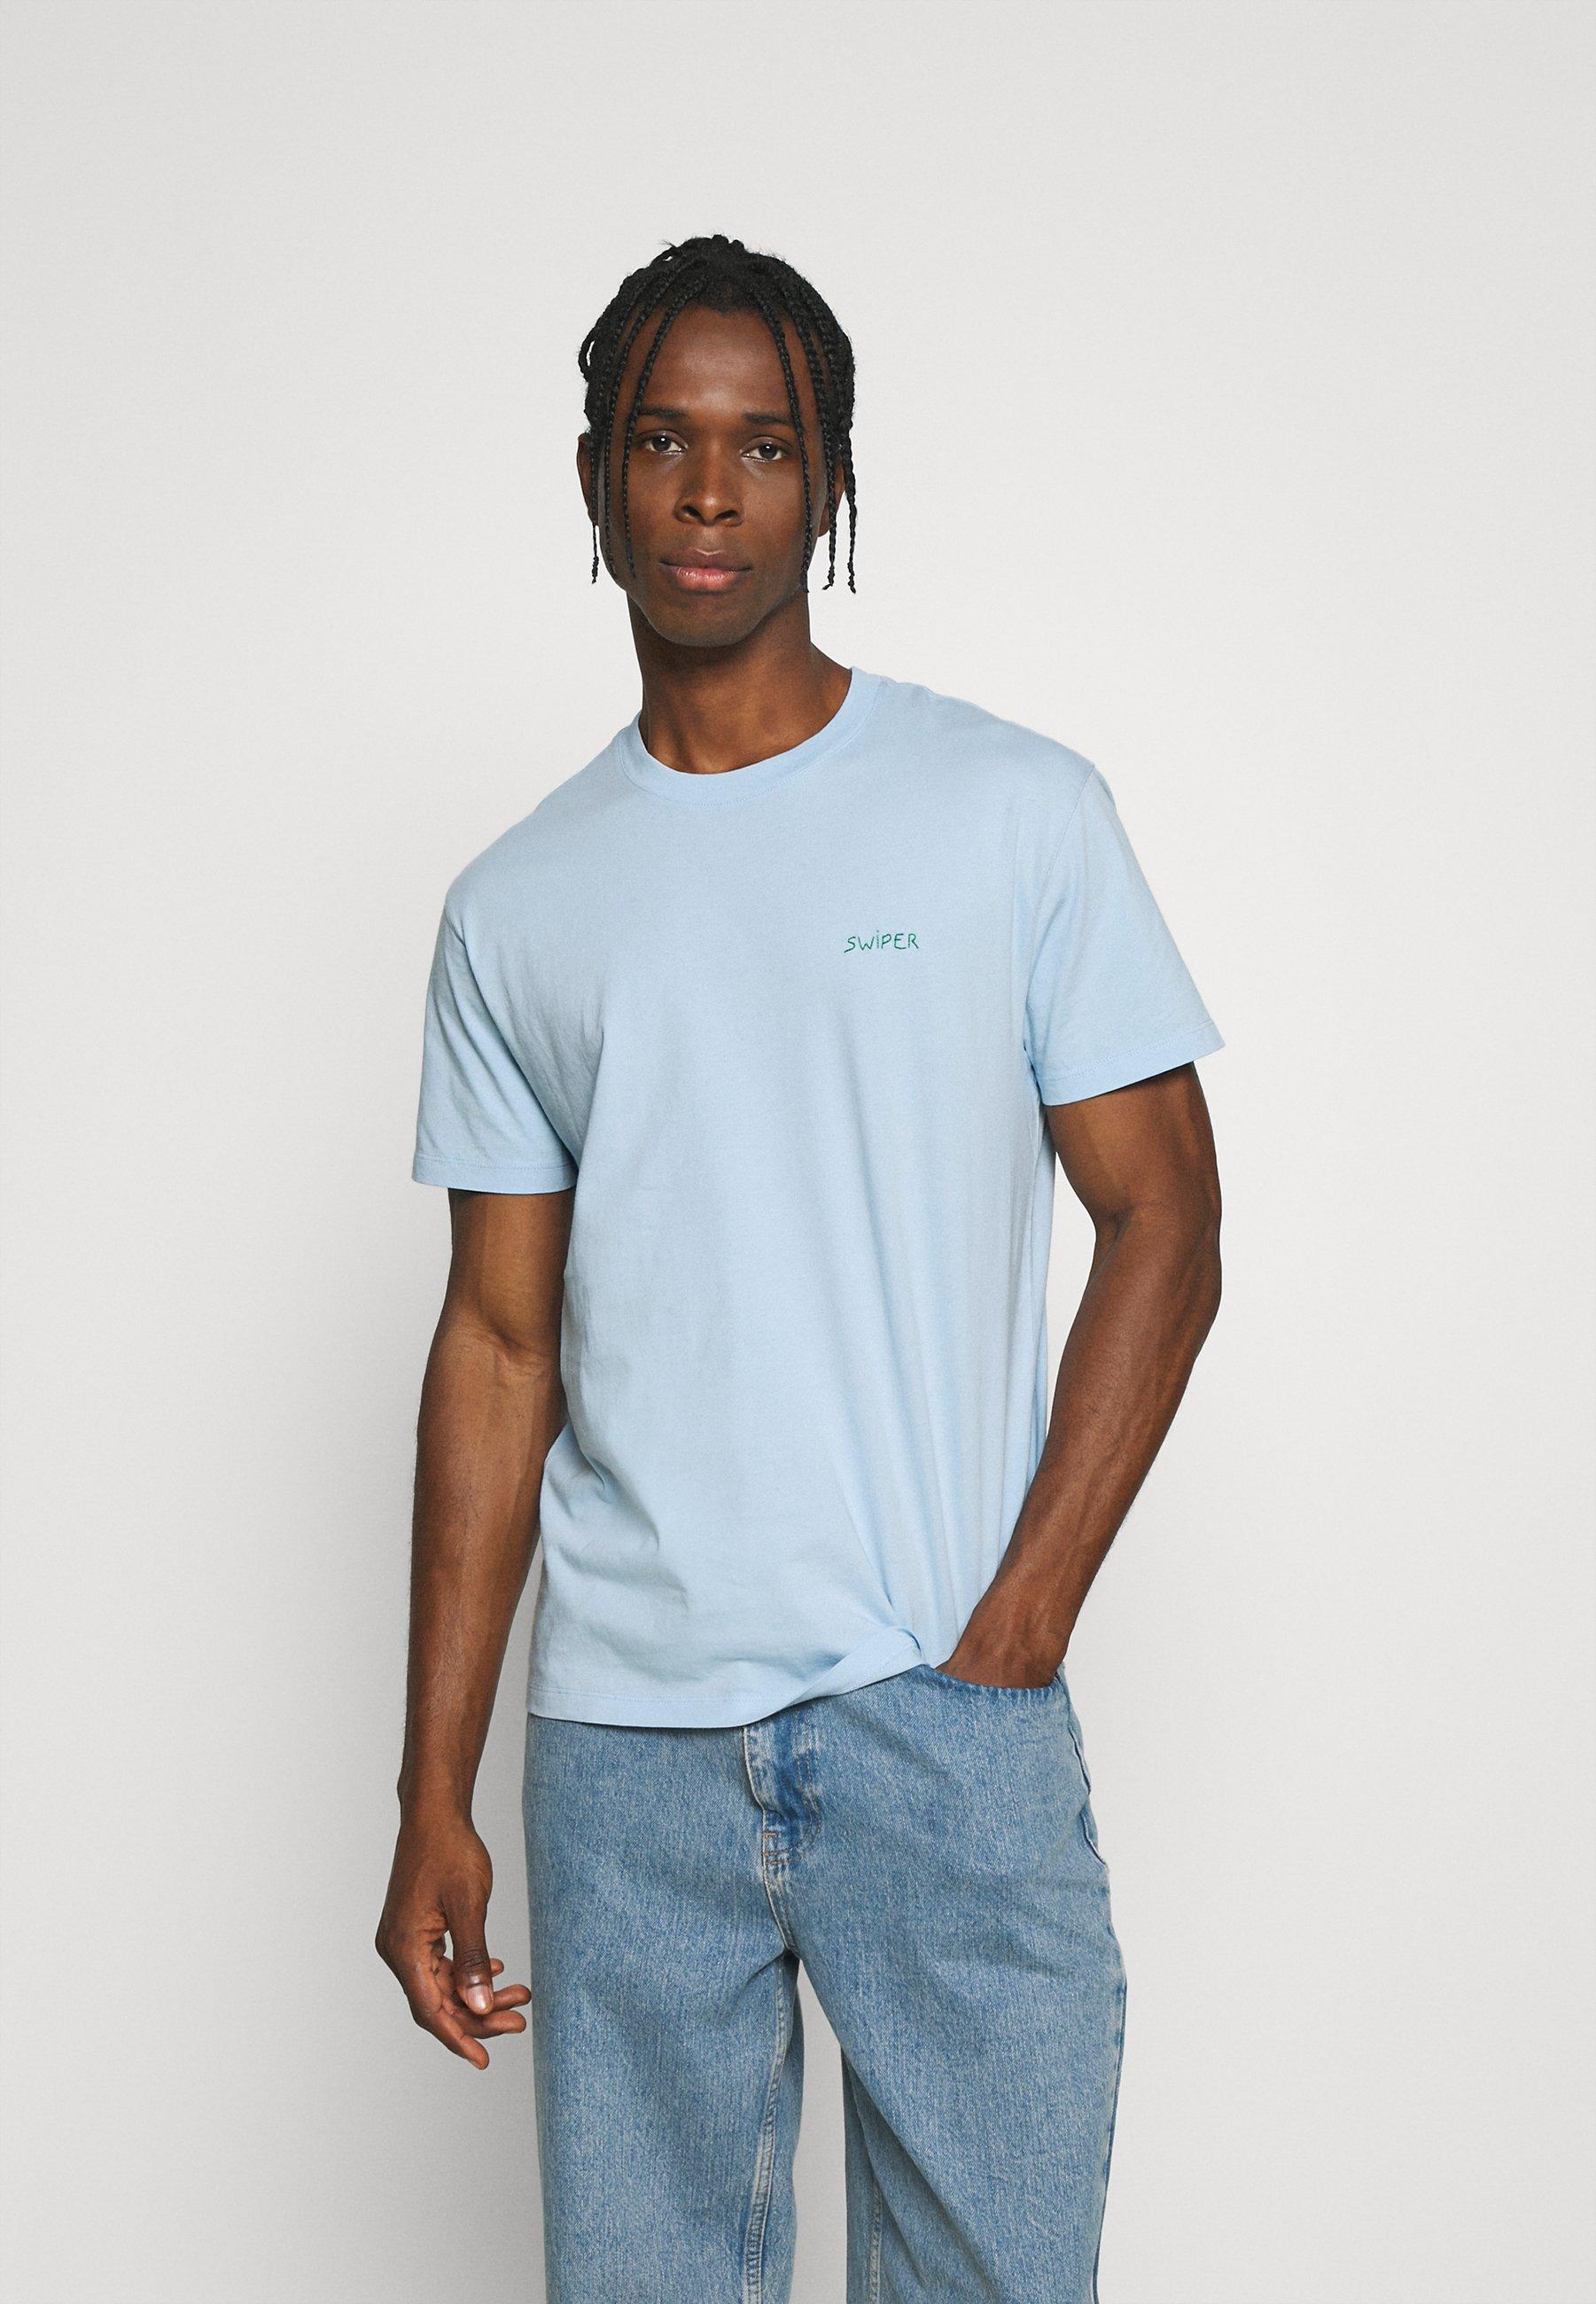 Homme TEE POPINCOURT SWIPER UNISEX - T-shirt basique